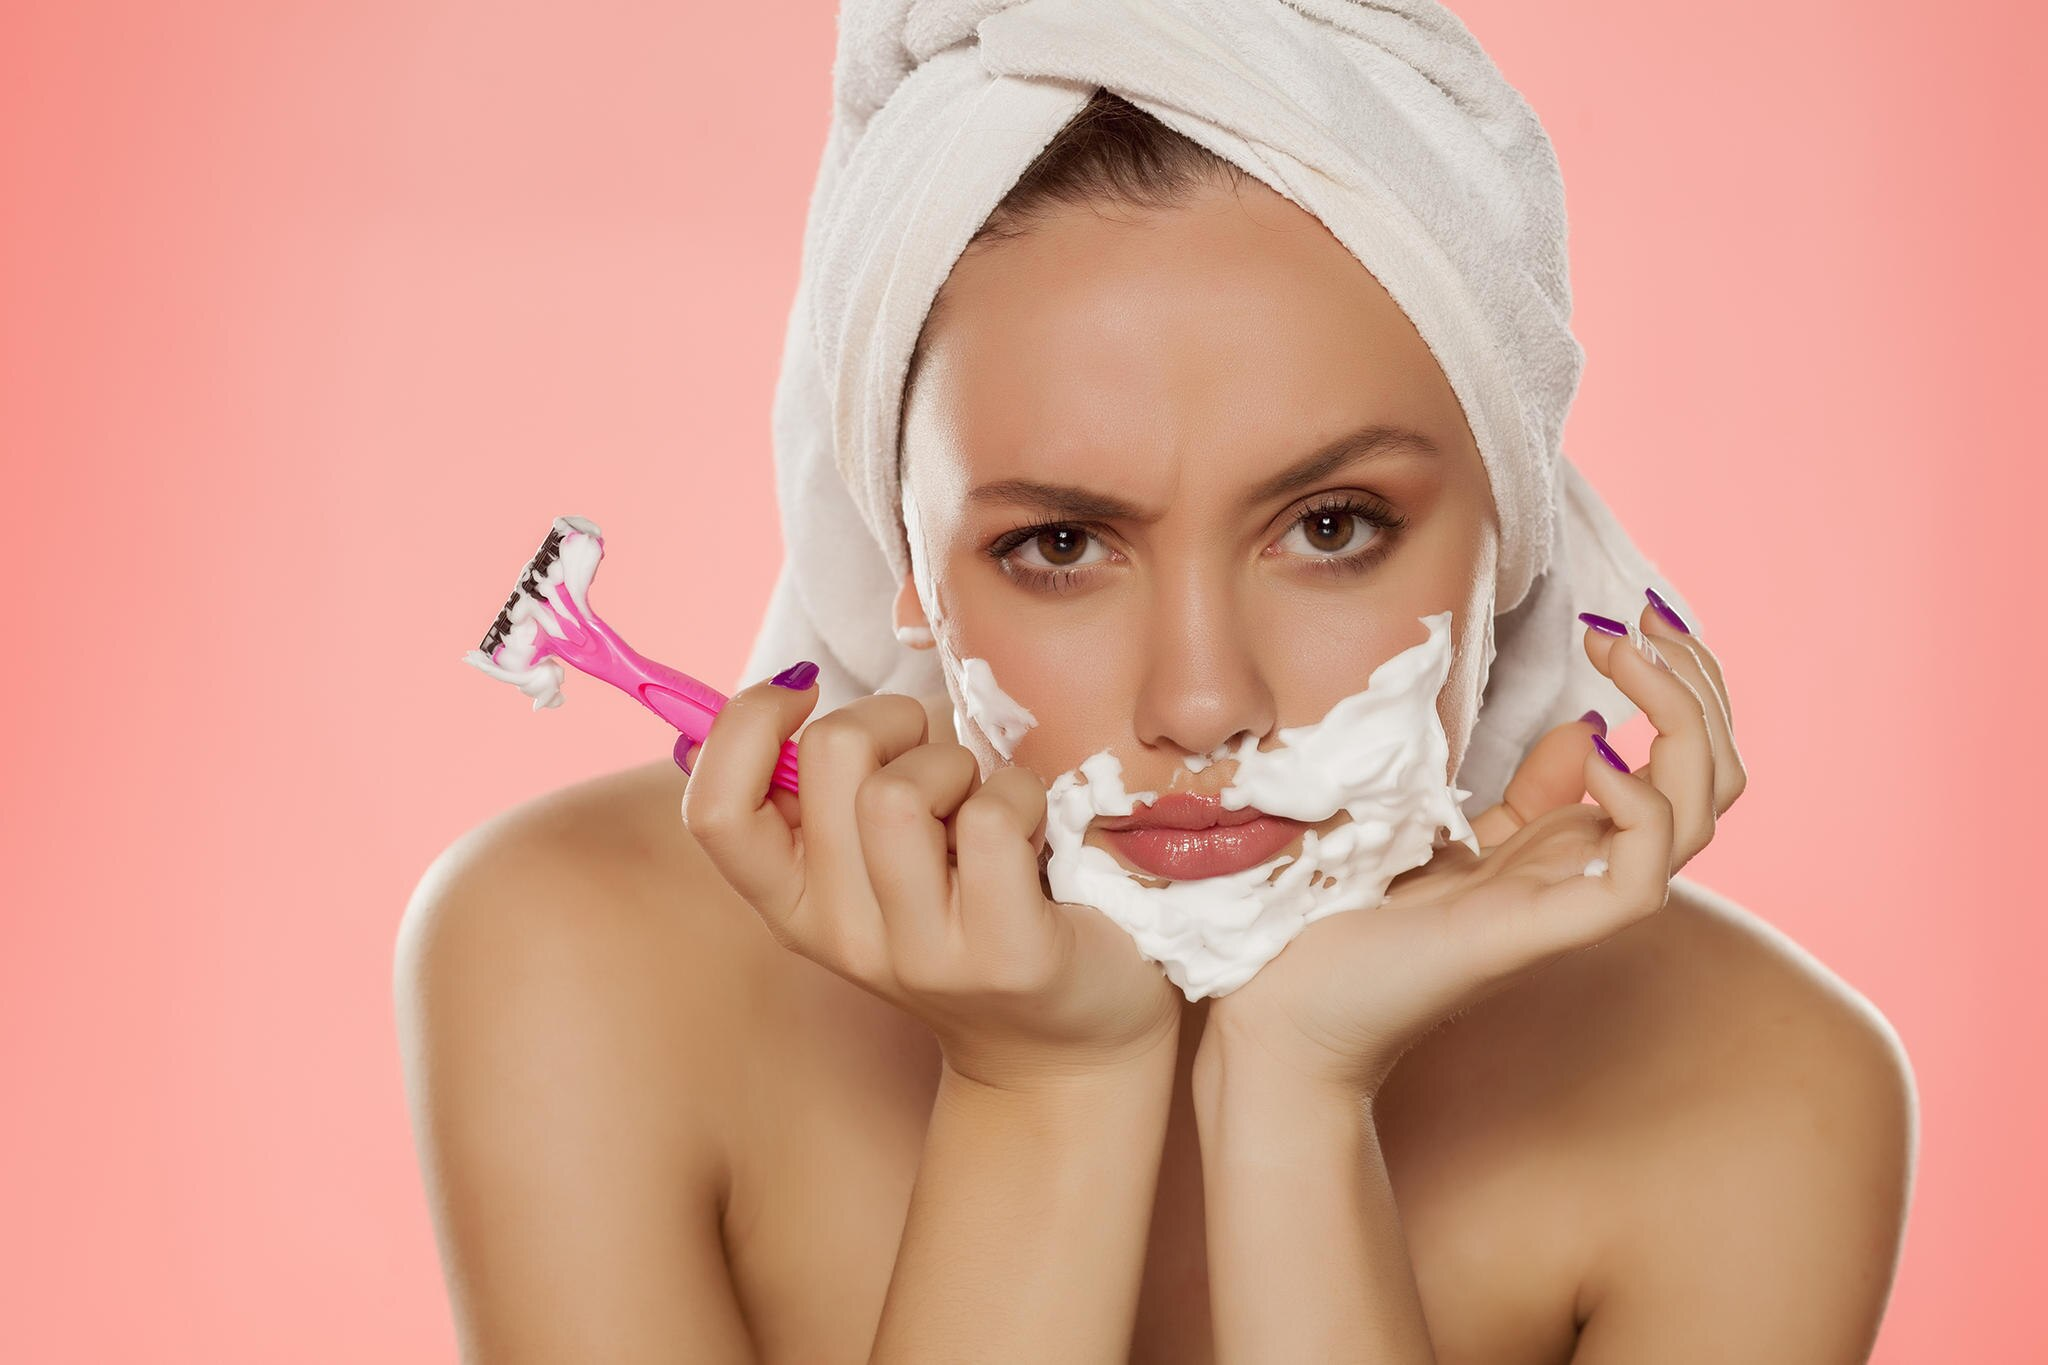 Haarentfernung-Damenbart-entfernen-alle-Arten-im-berblick